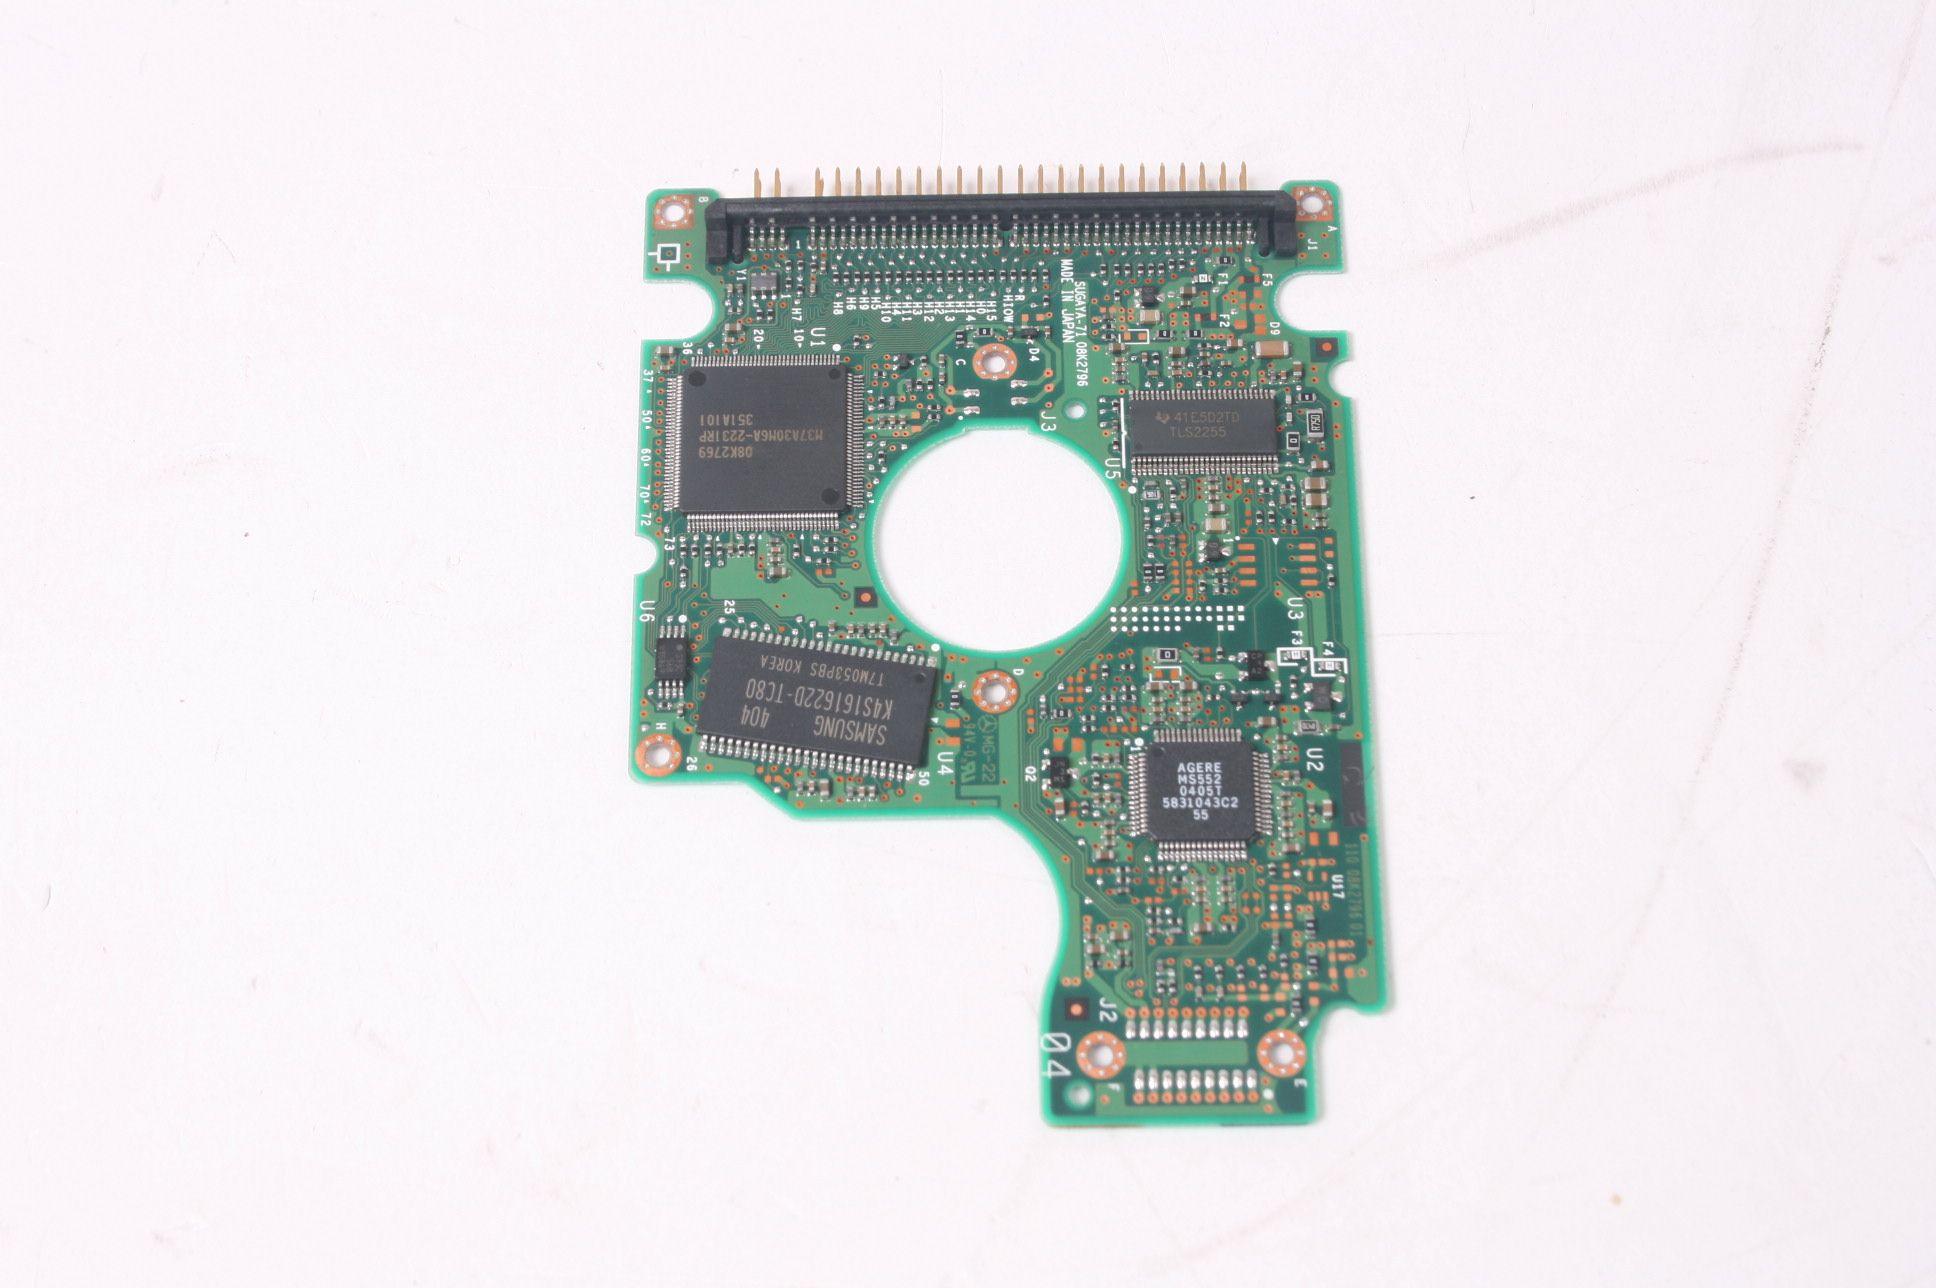 HITACHI IC25N00ATMR04-0 60GB 2.5 IDE HARD DRIVE / PCB (CIRCUIT BOARD) ONLY FOR DA